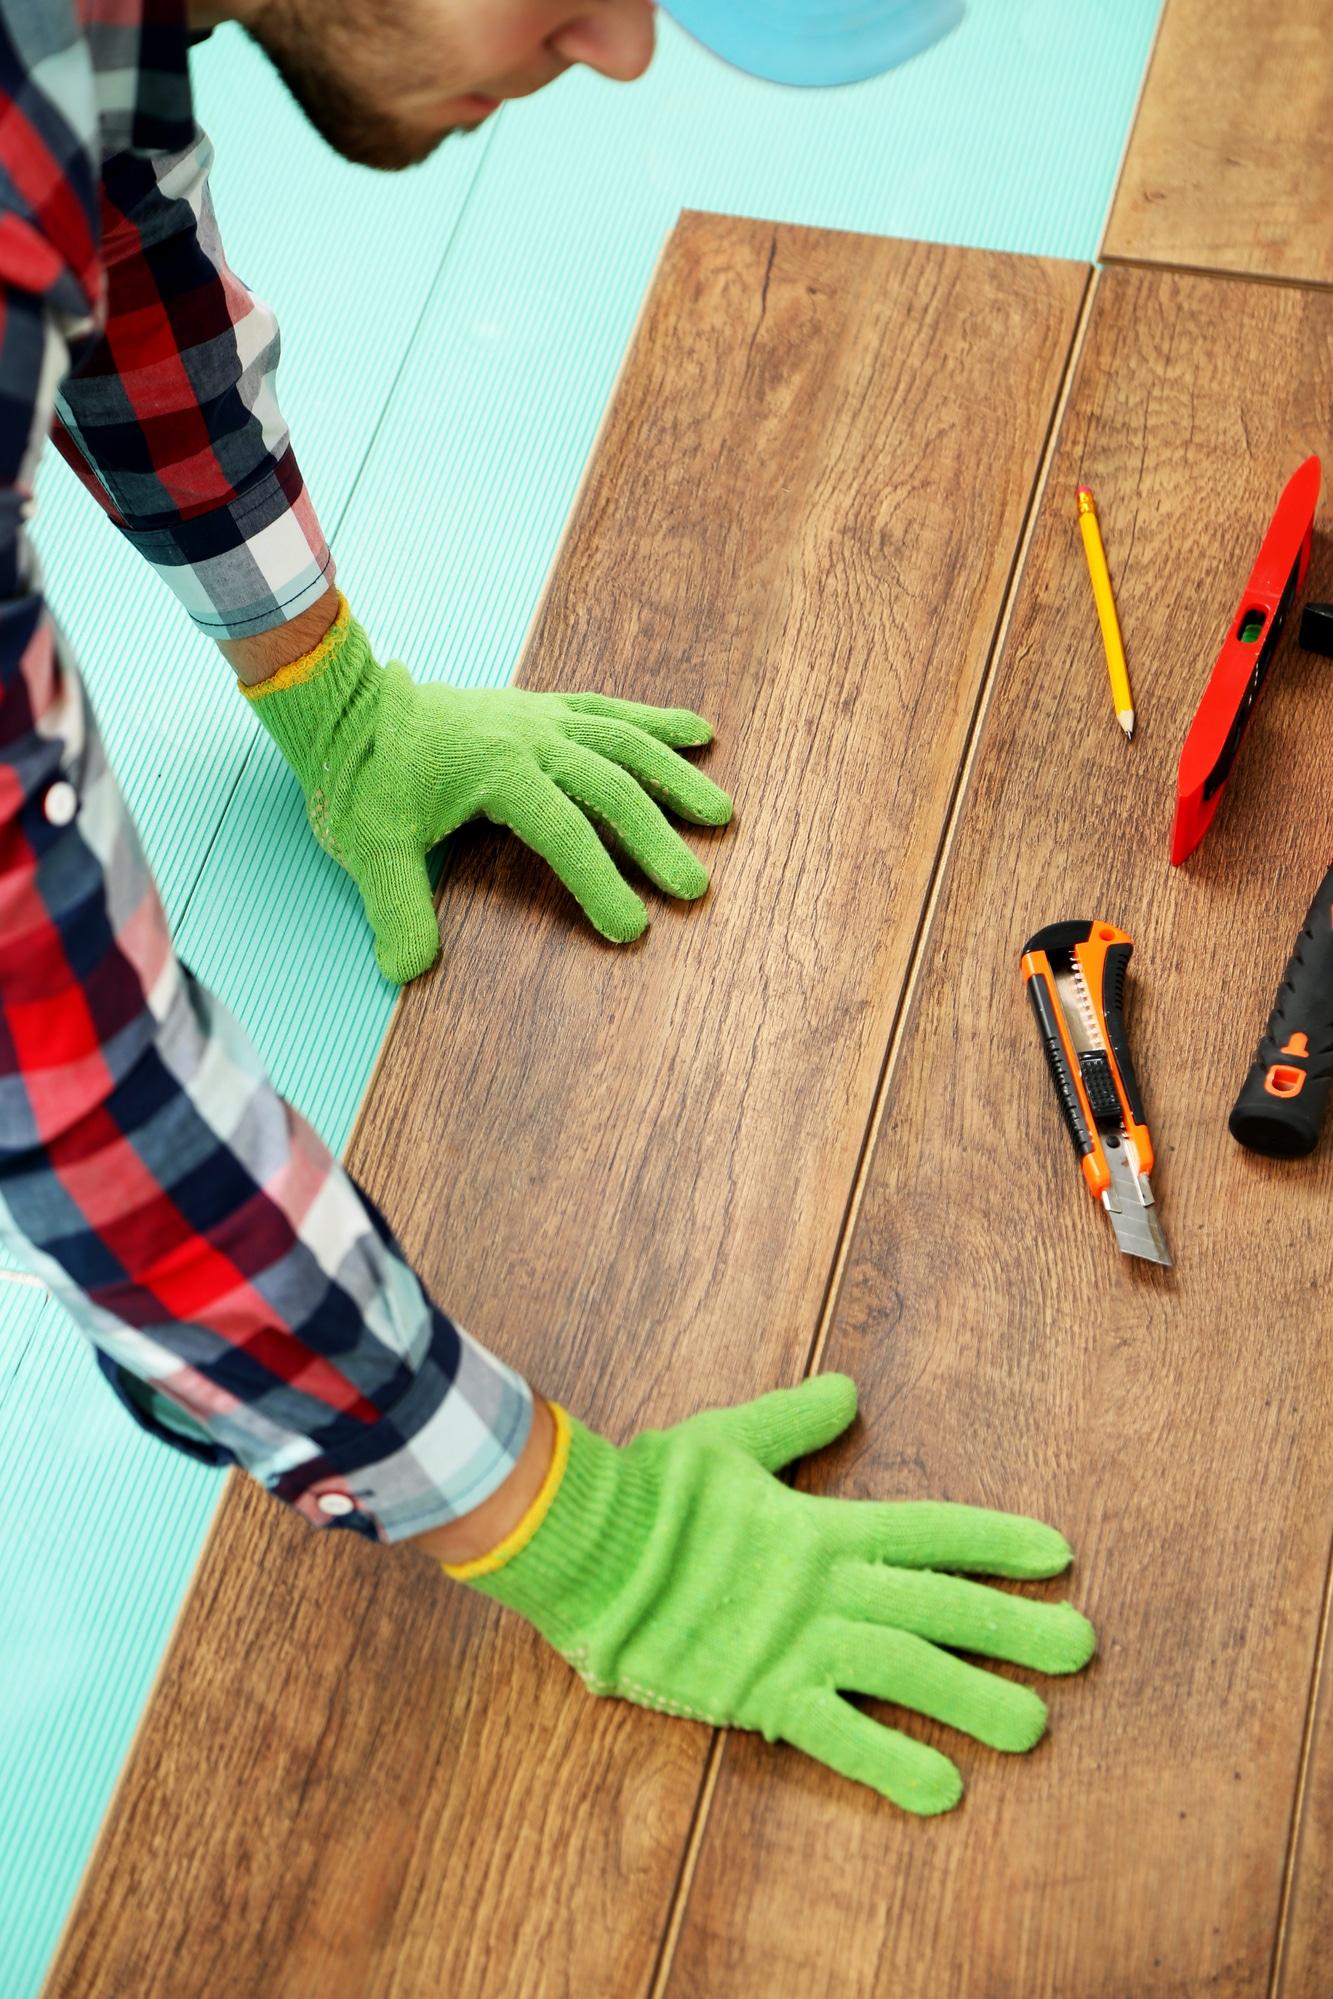 Advantages and Disadvantages of Parquet Flooring